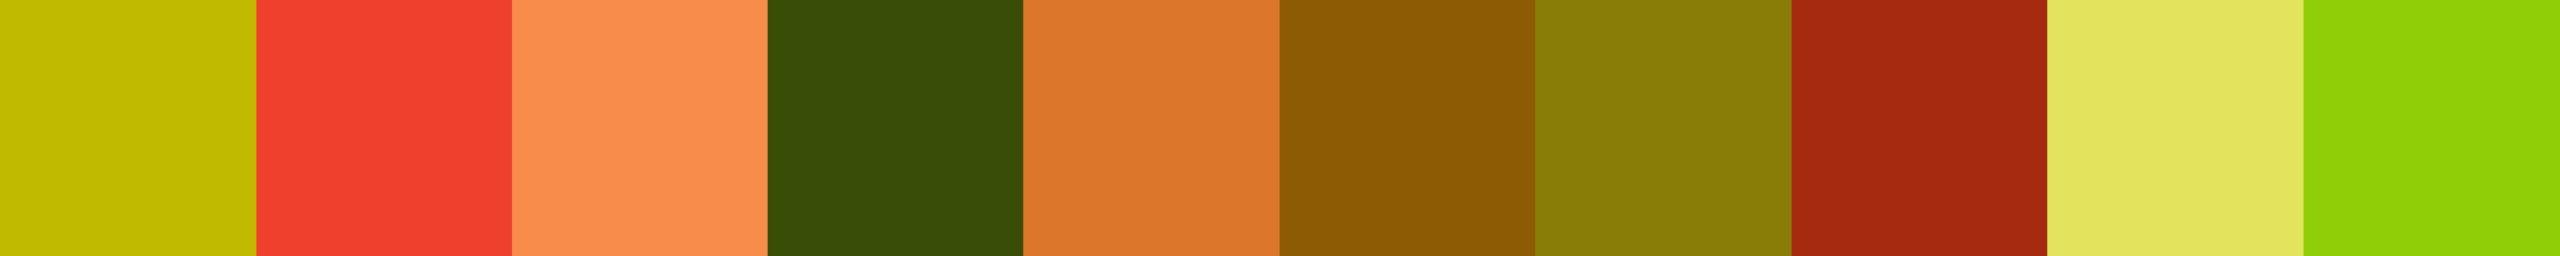 439 Stimoke Color Palette